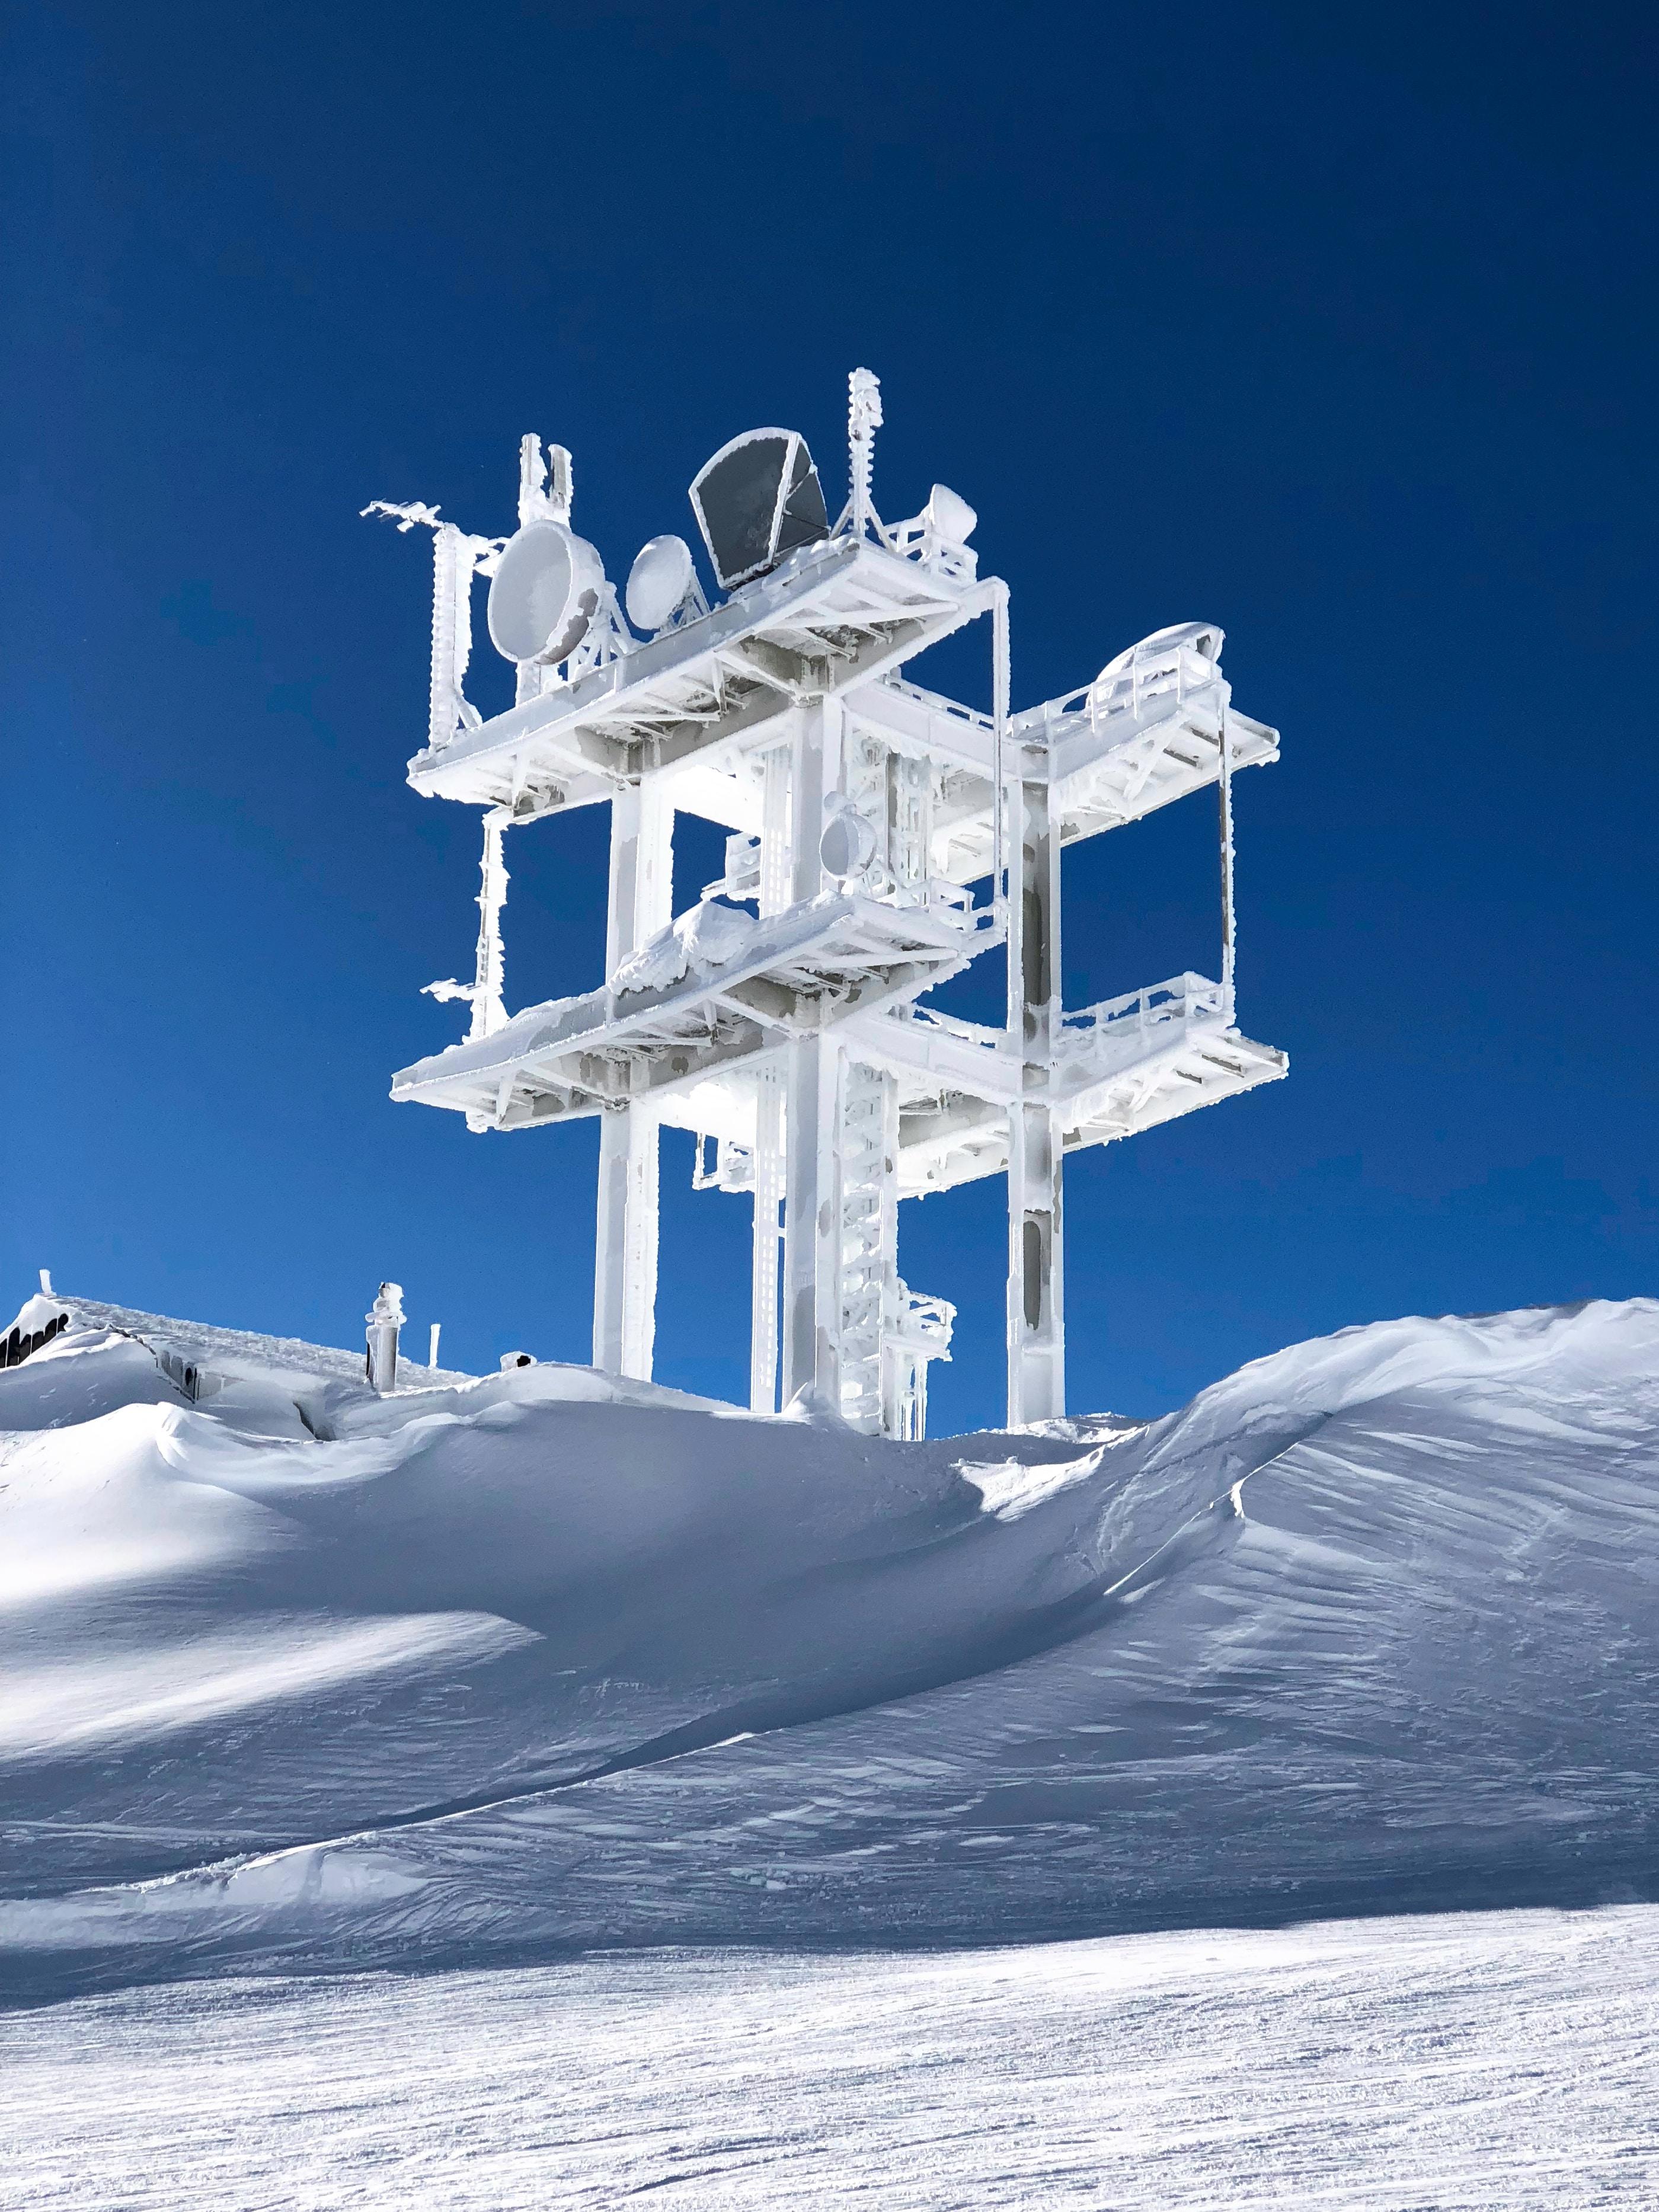 white satellite on snow covered hills